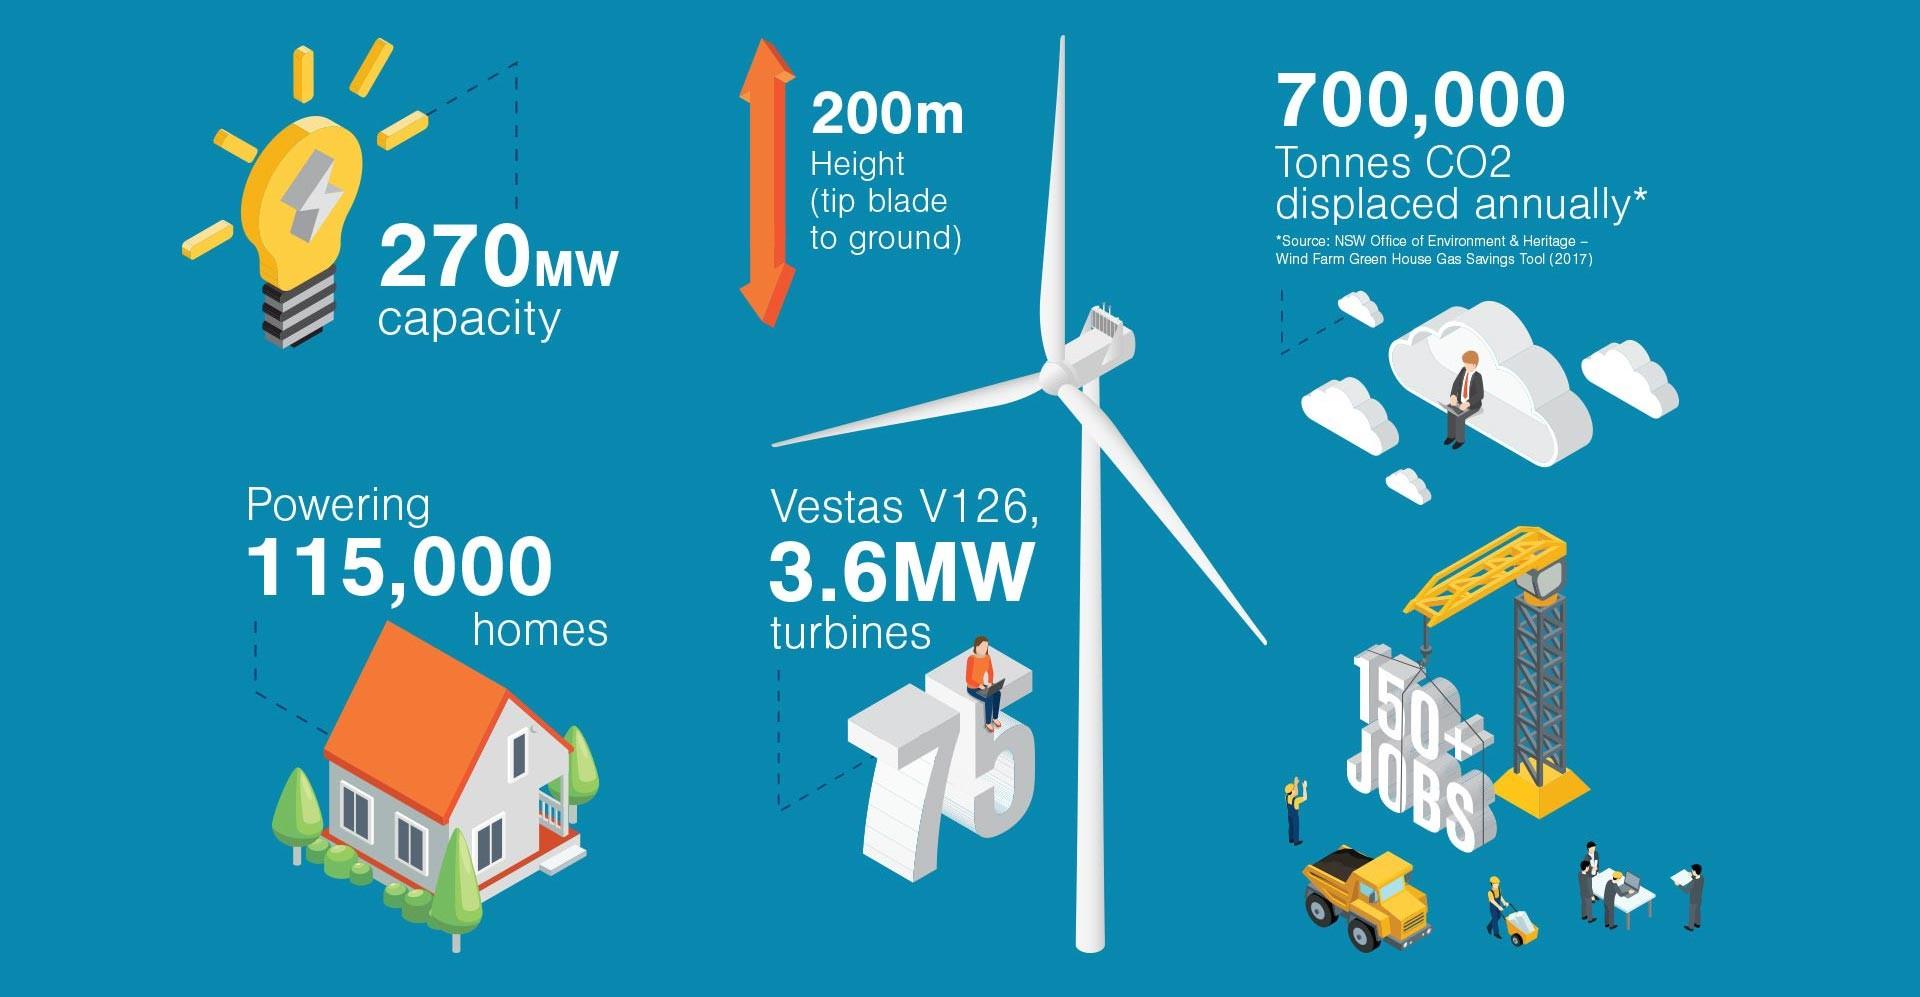 Sapphire Wind Farm Energy Power